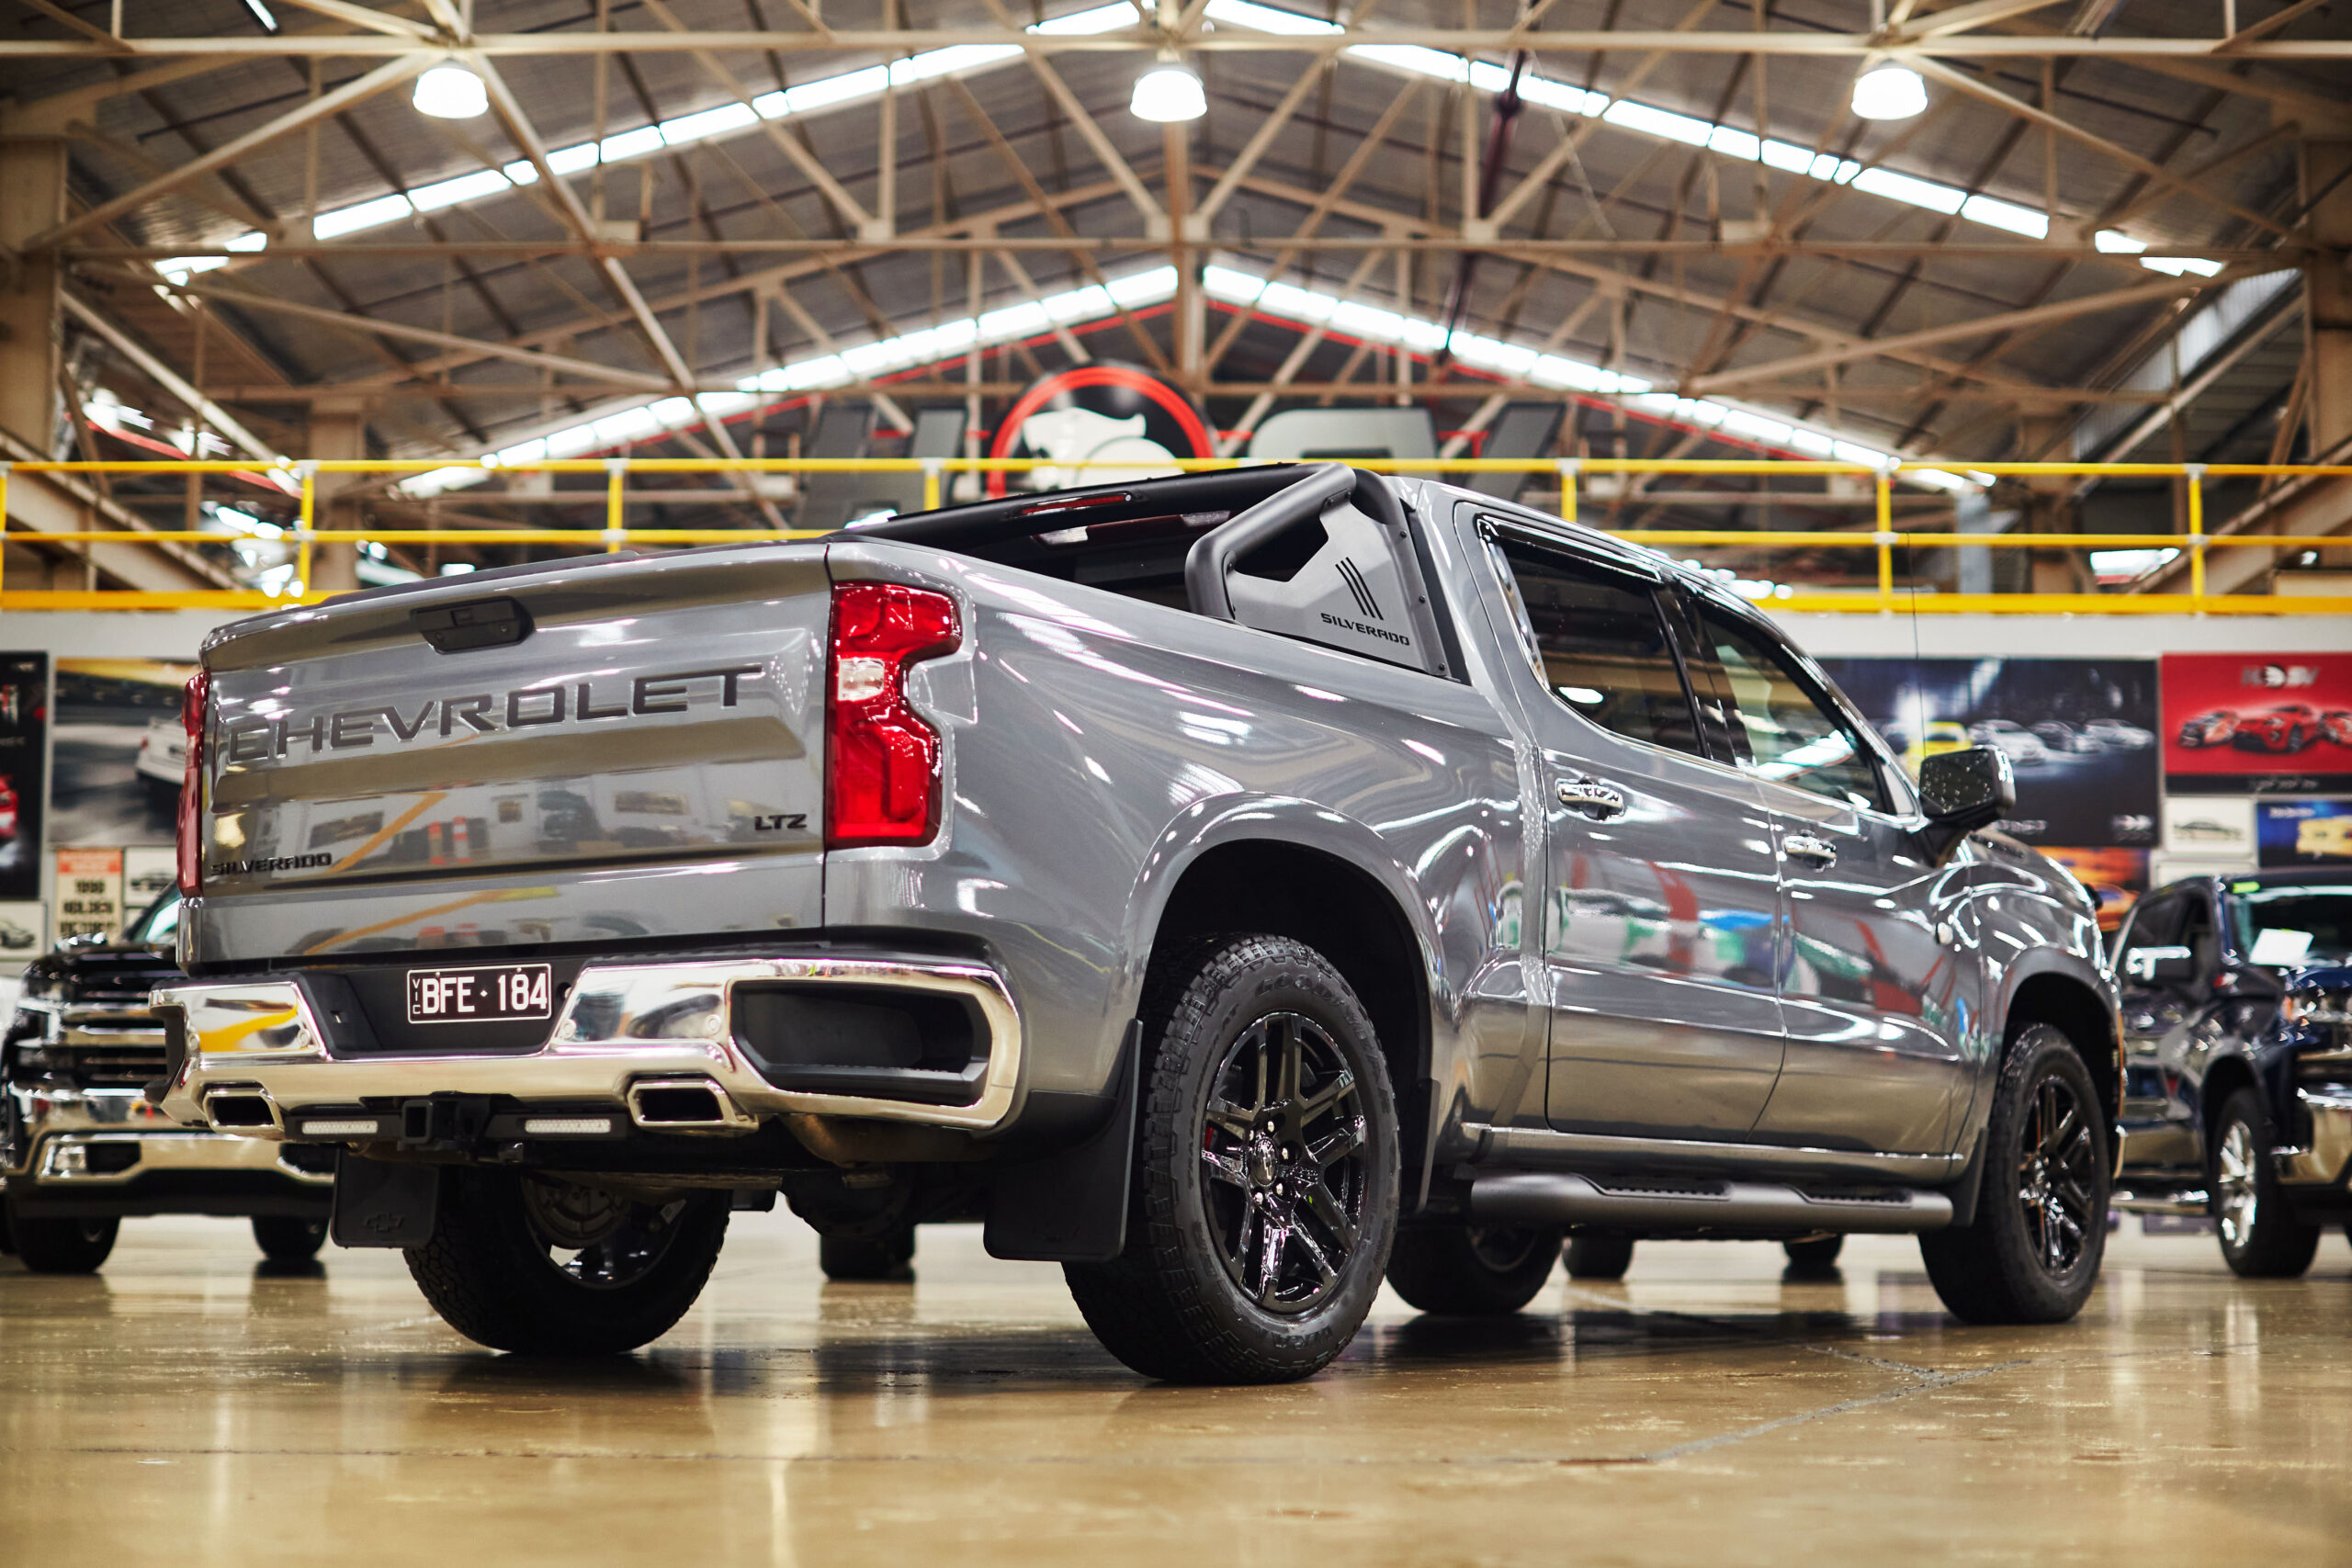 Holden Special Vehicles Chevrolet Silverado 1500 Front